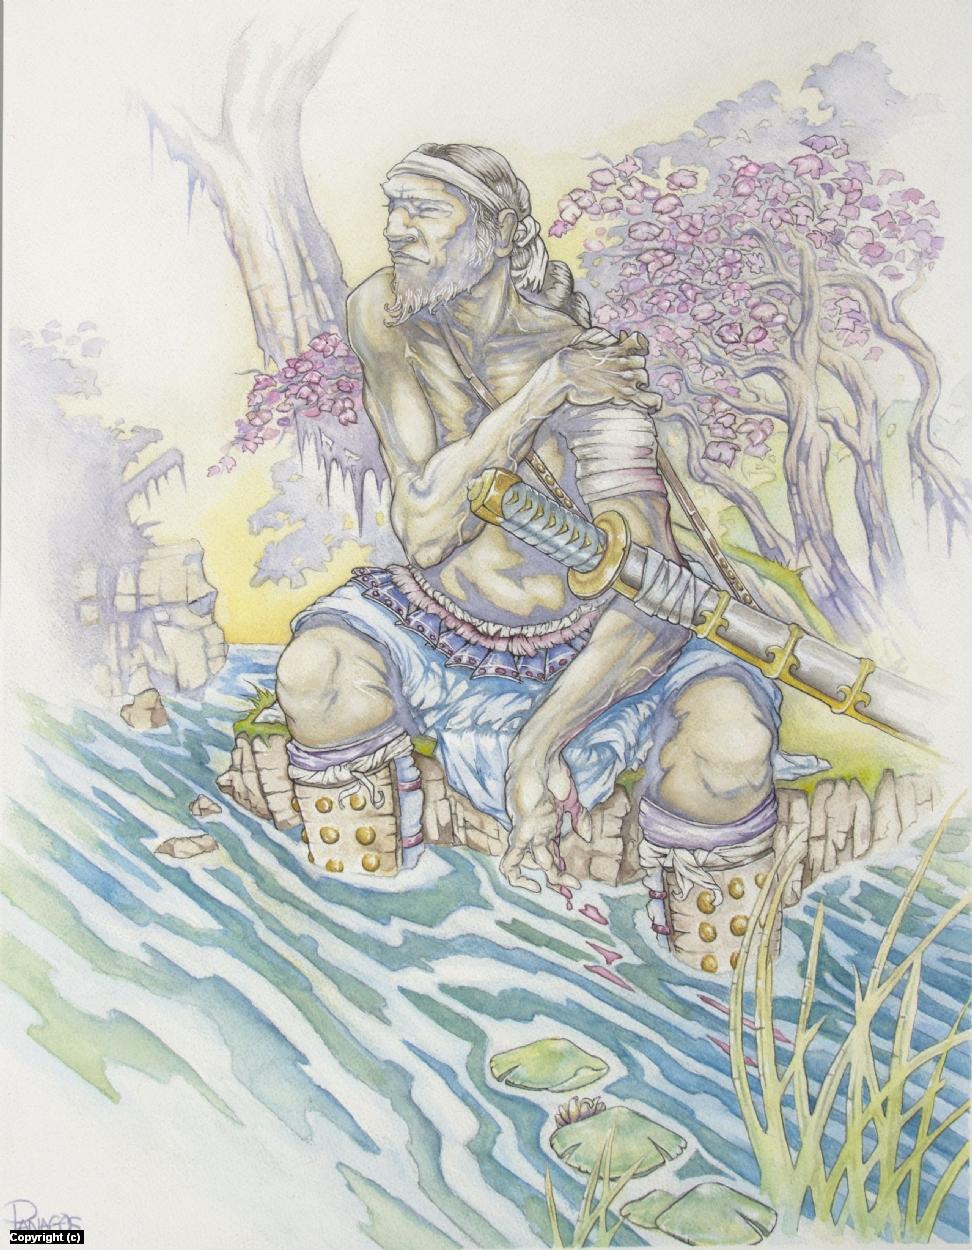 The Stream Artwork by Tim  Panagos